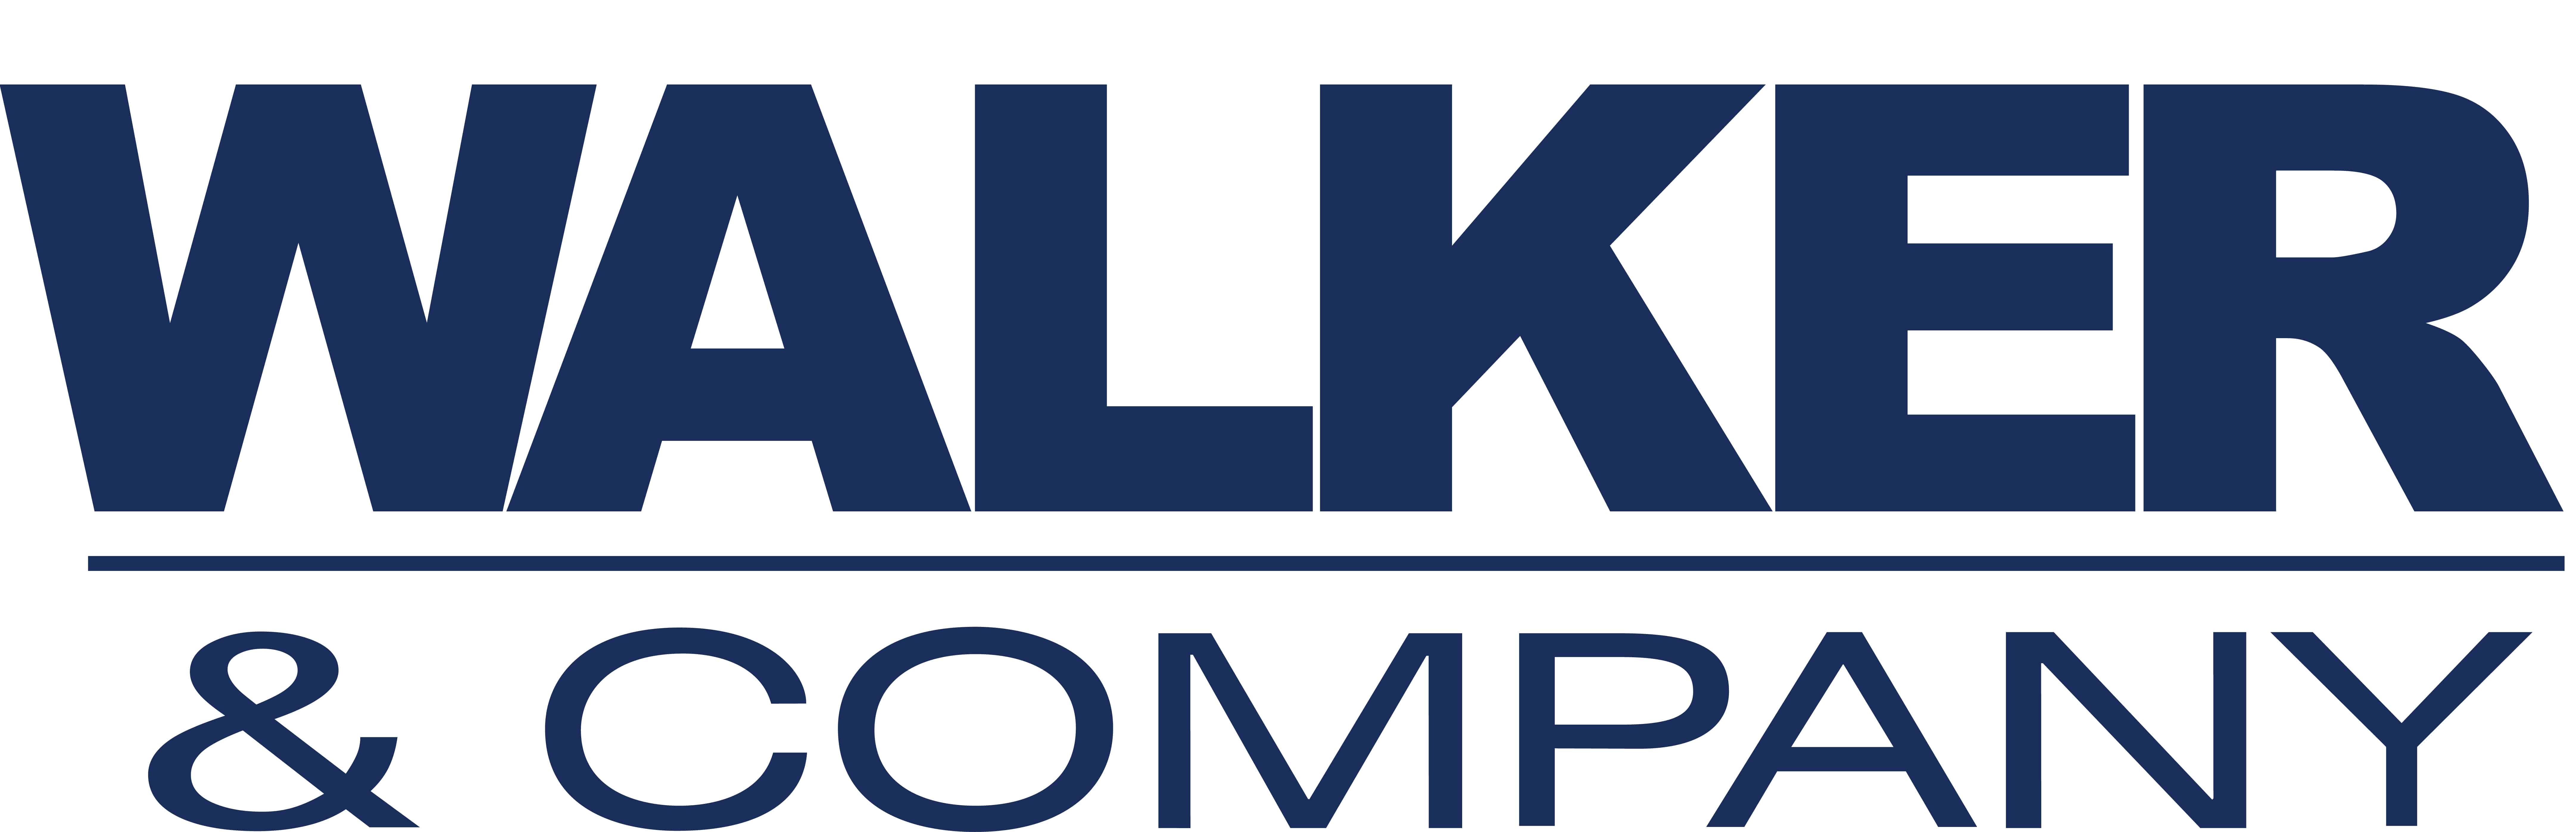 Walker & Co. company name